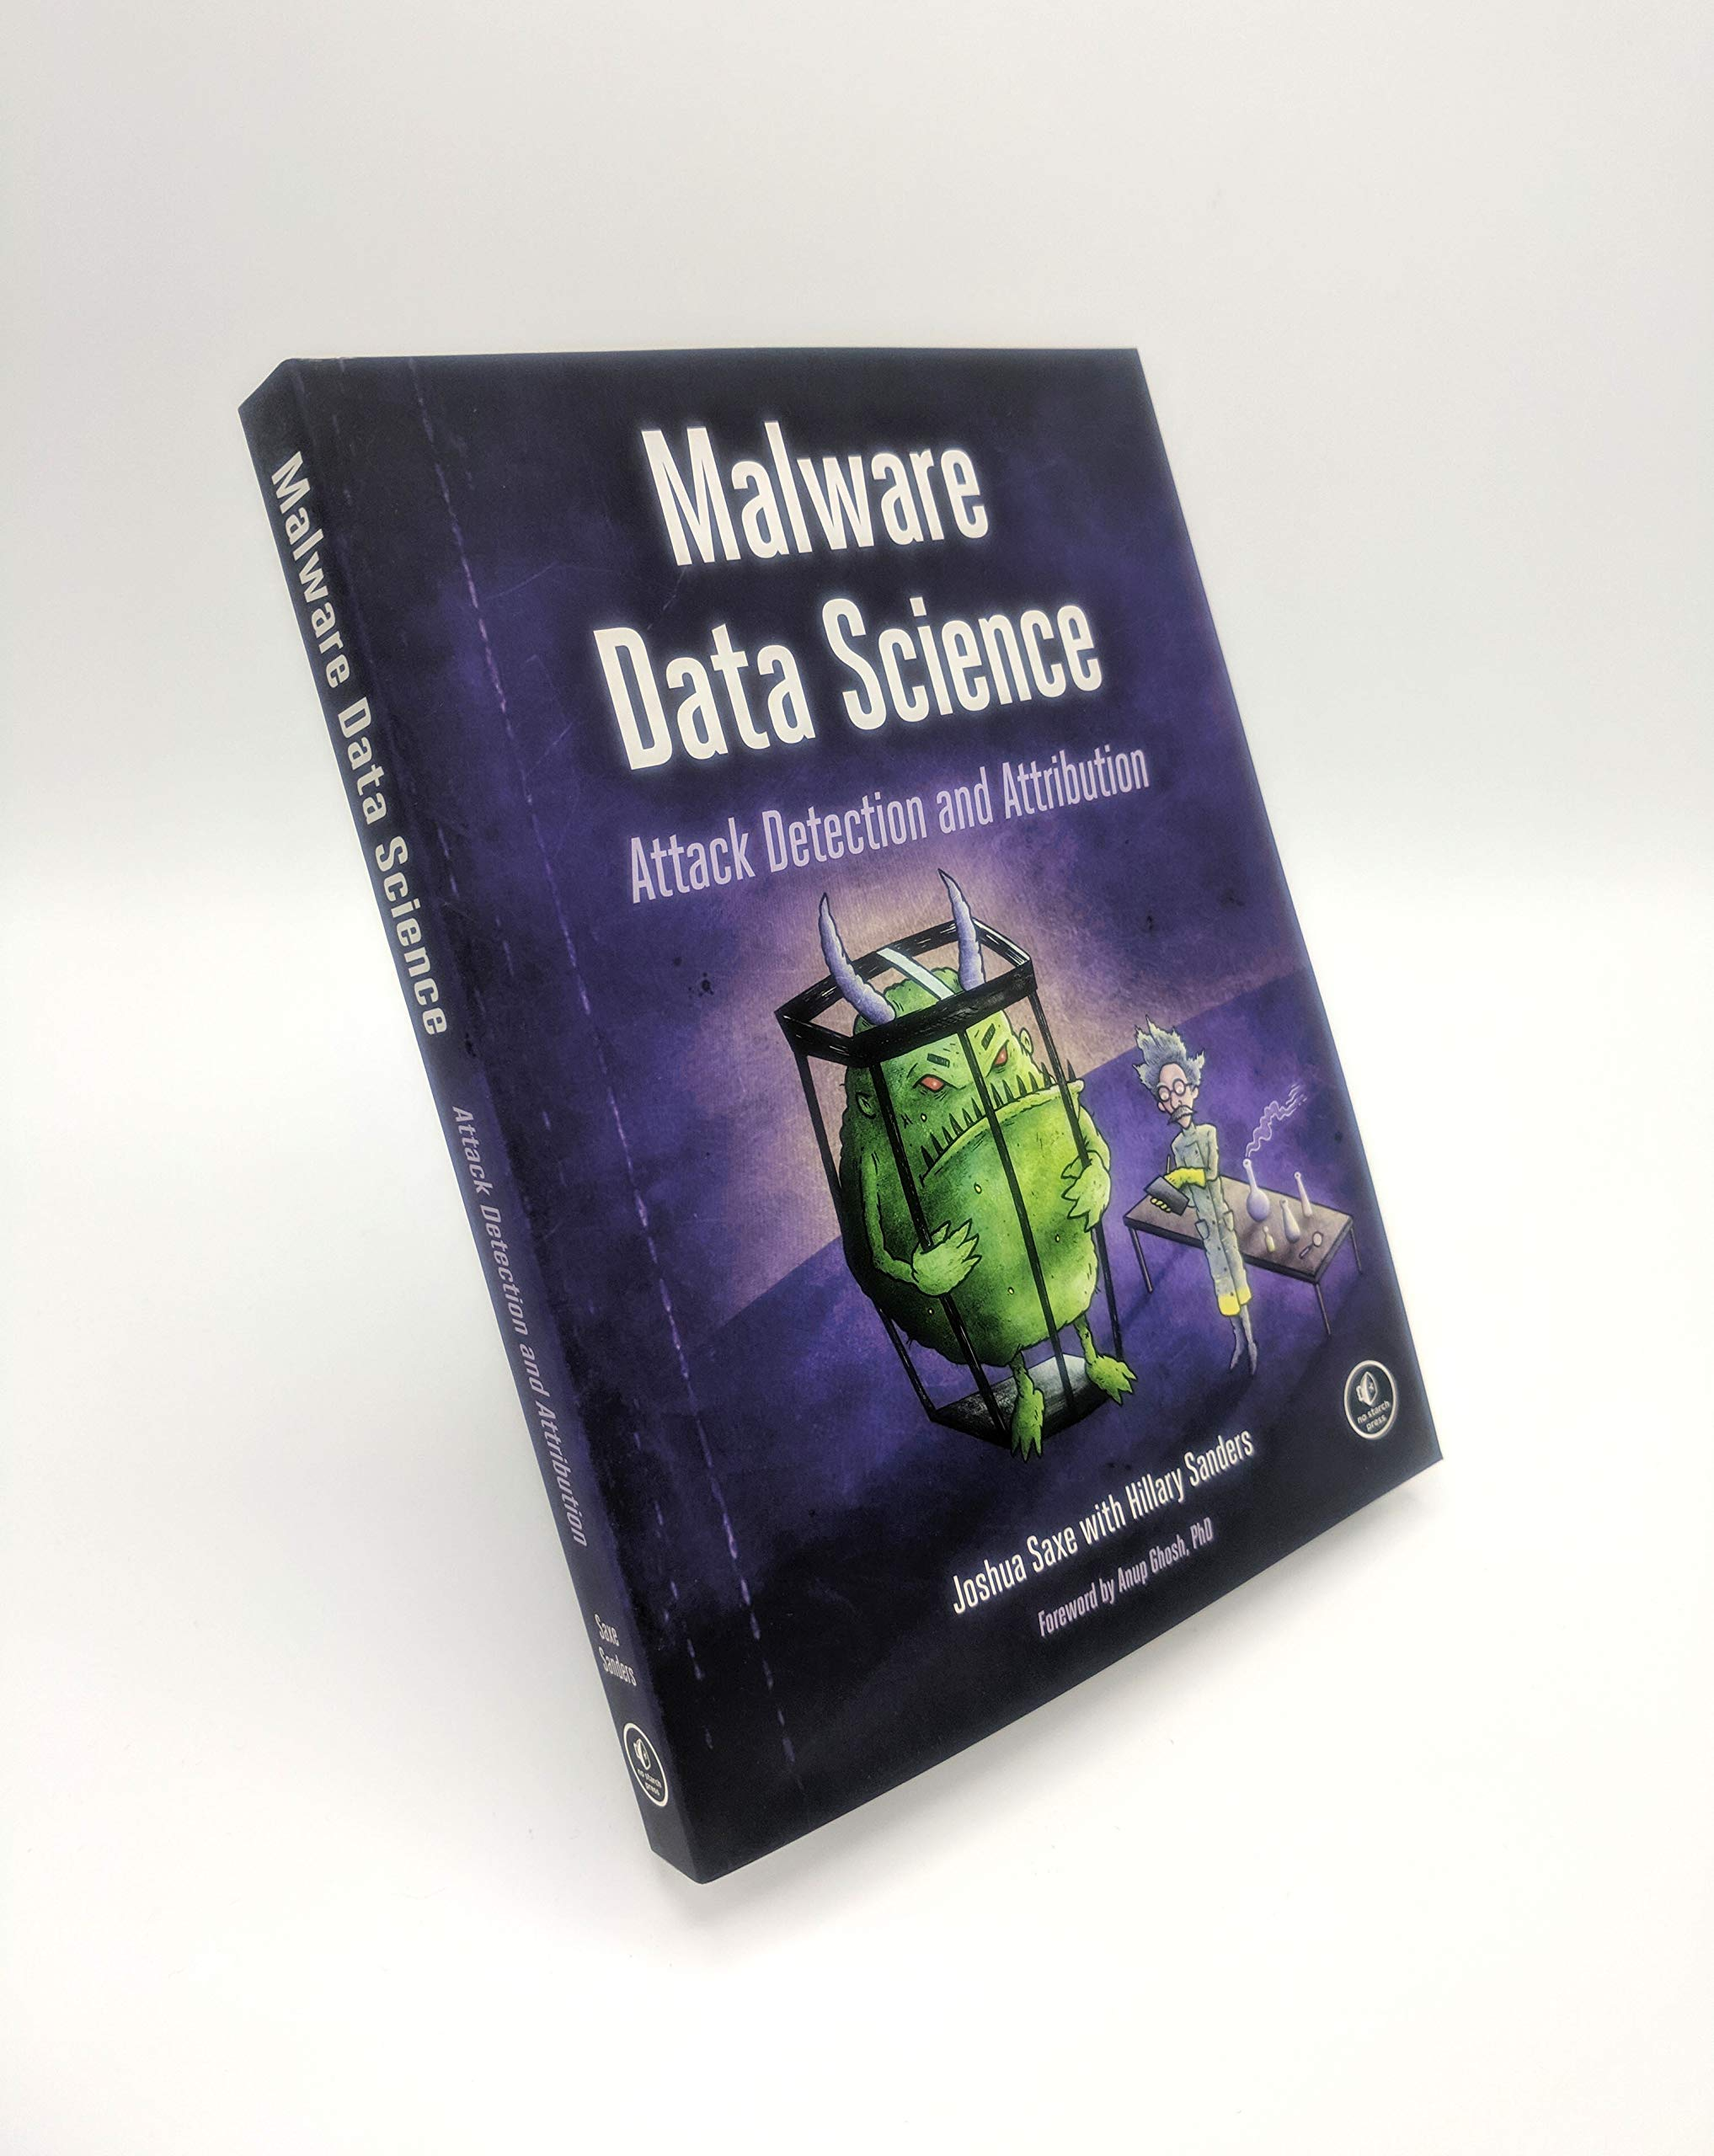 Malware Data Science: Attack Detection and Attribution: Amazon.es: Joshua Saxe: Libros en idiomas extranjeros